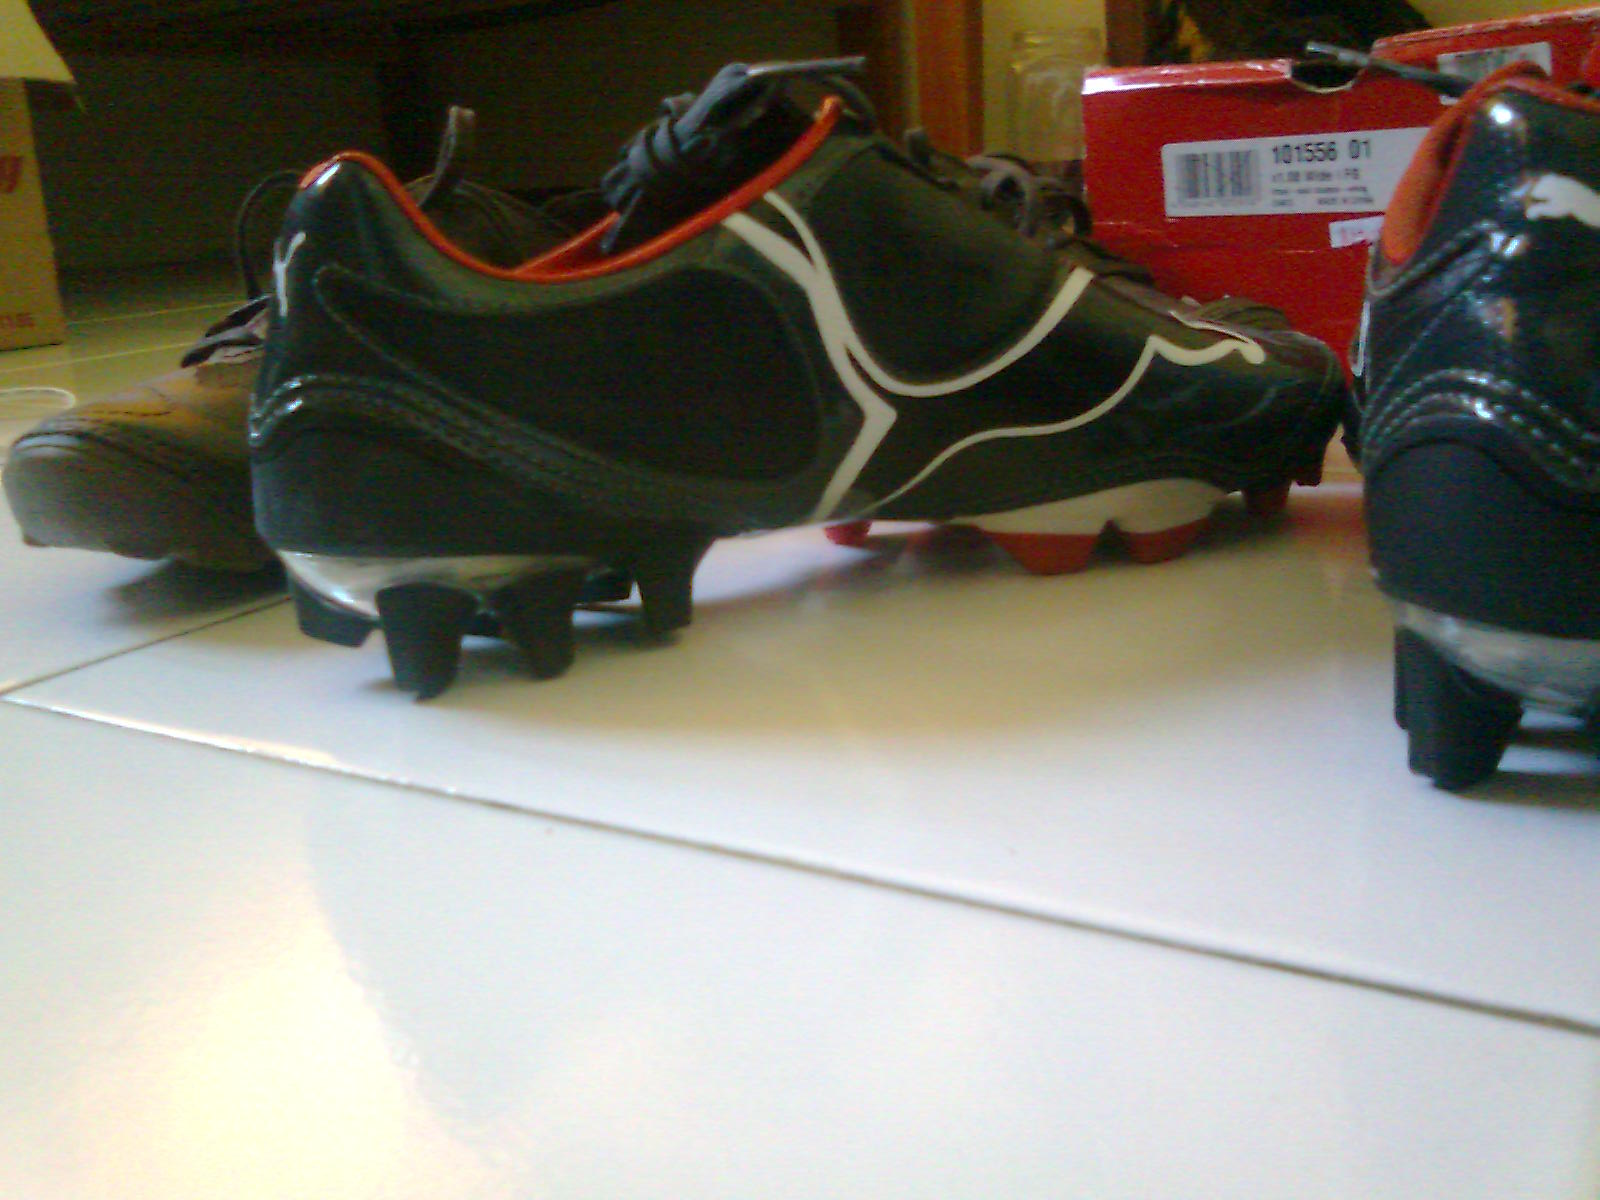 Football and Futsal Boots  REVIEW - Puma V1.08 FG 2bd7500bb29f4